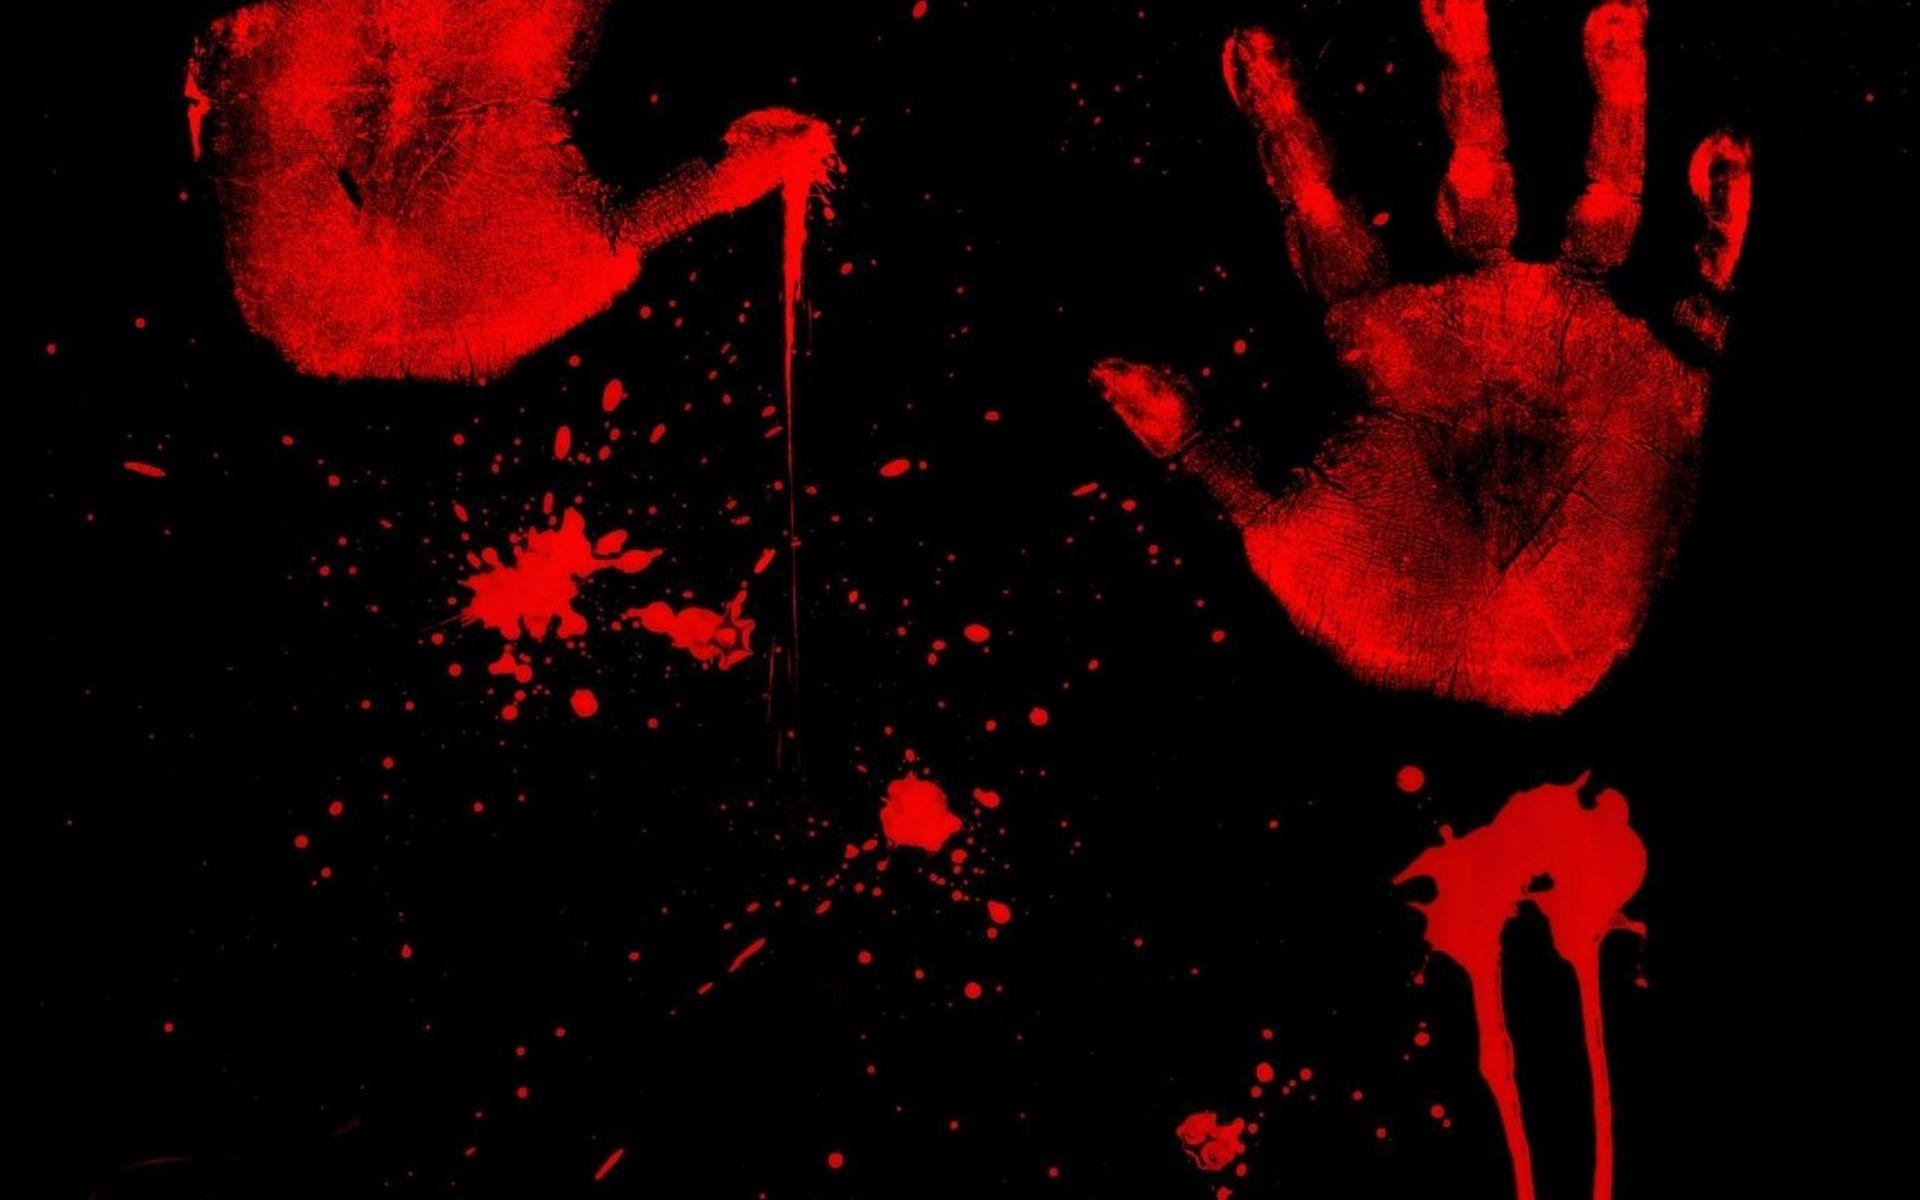 Bloody Handprints (Image: novayagazeta.ru)